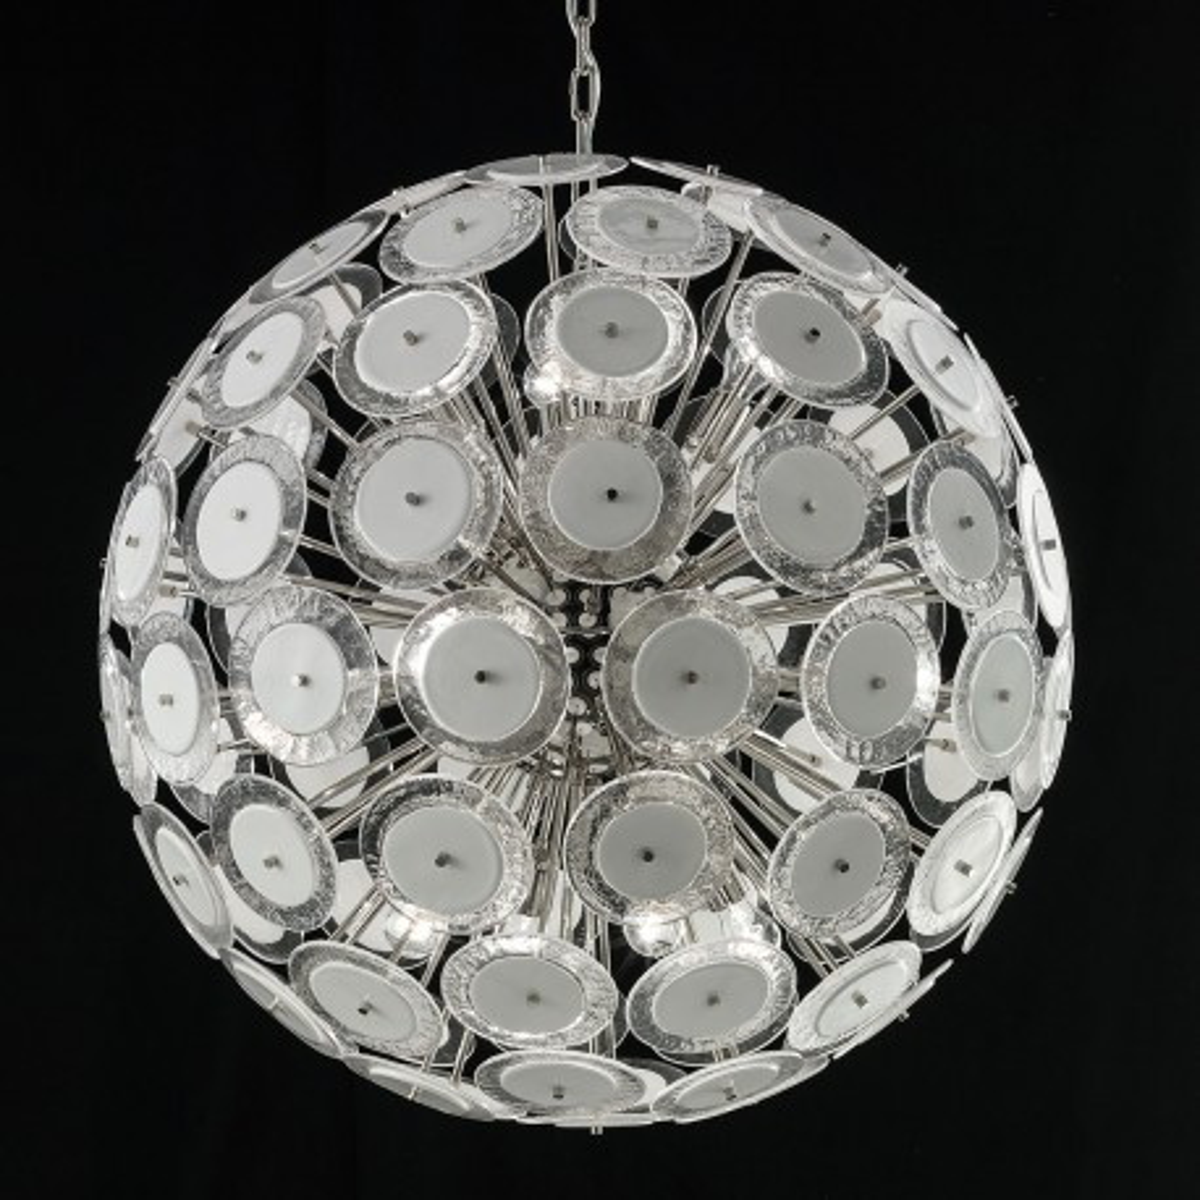 """Globo"" lustre en cristal de Murano - 12 lumières - blanc et nickel"